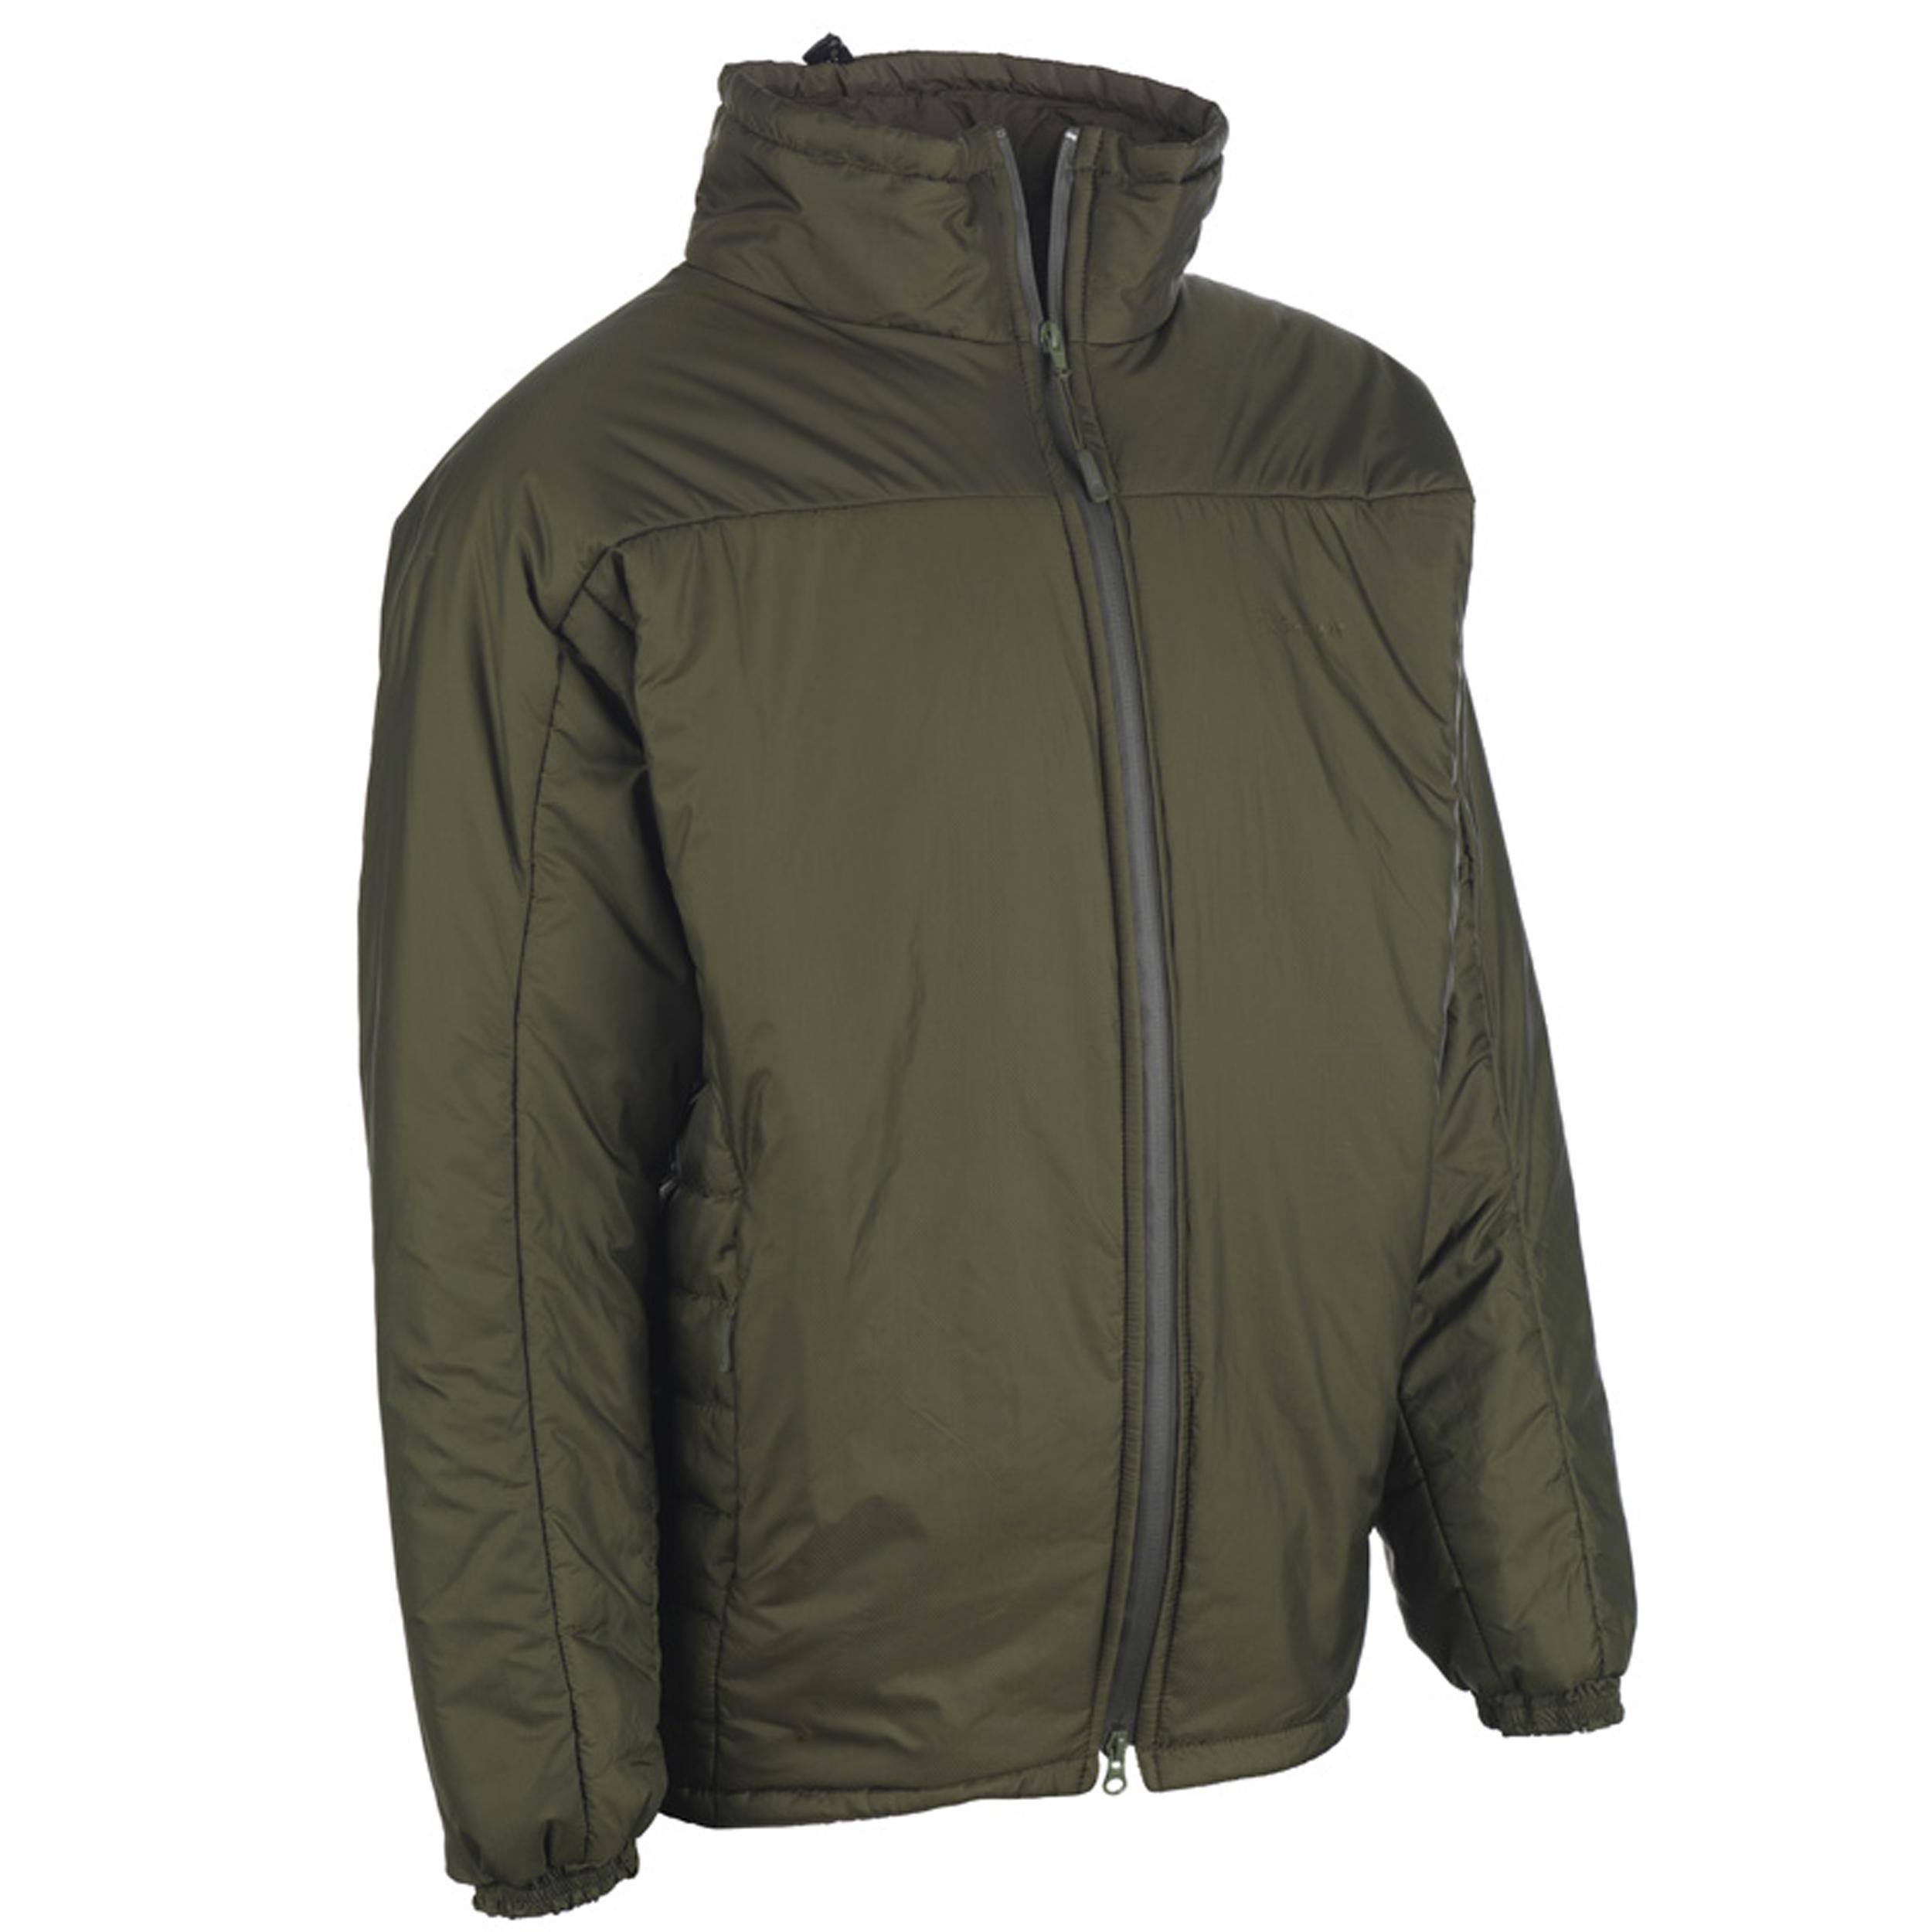 Snugpak Sj9 Jacket Olive MD